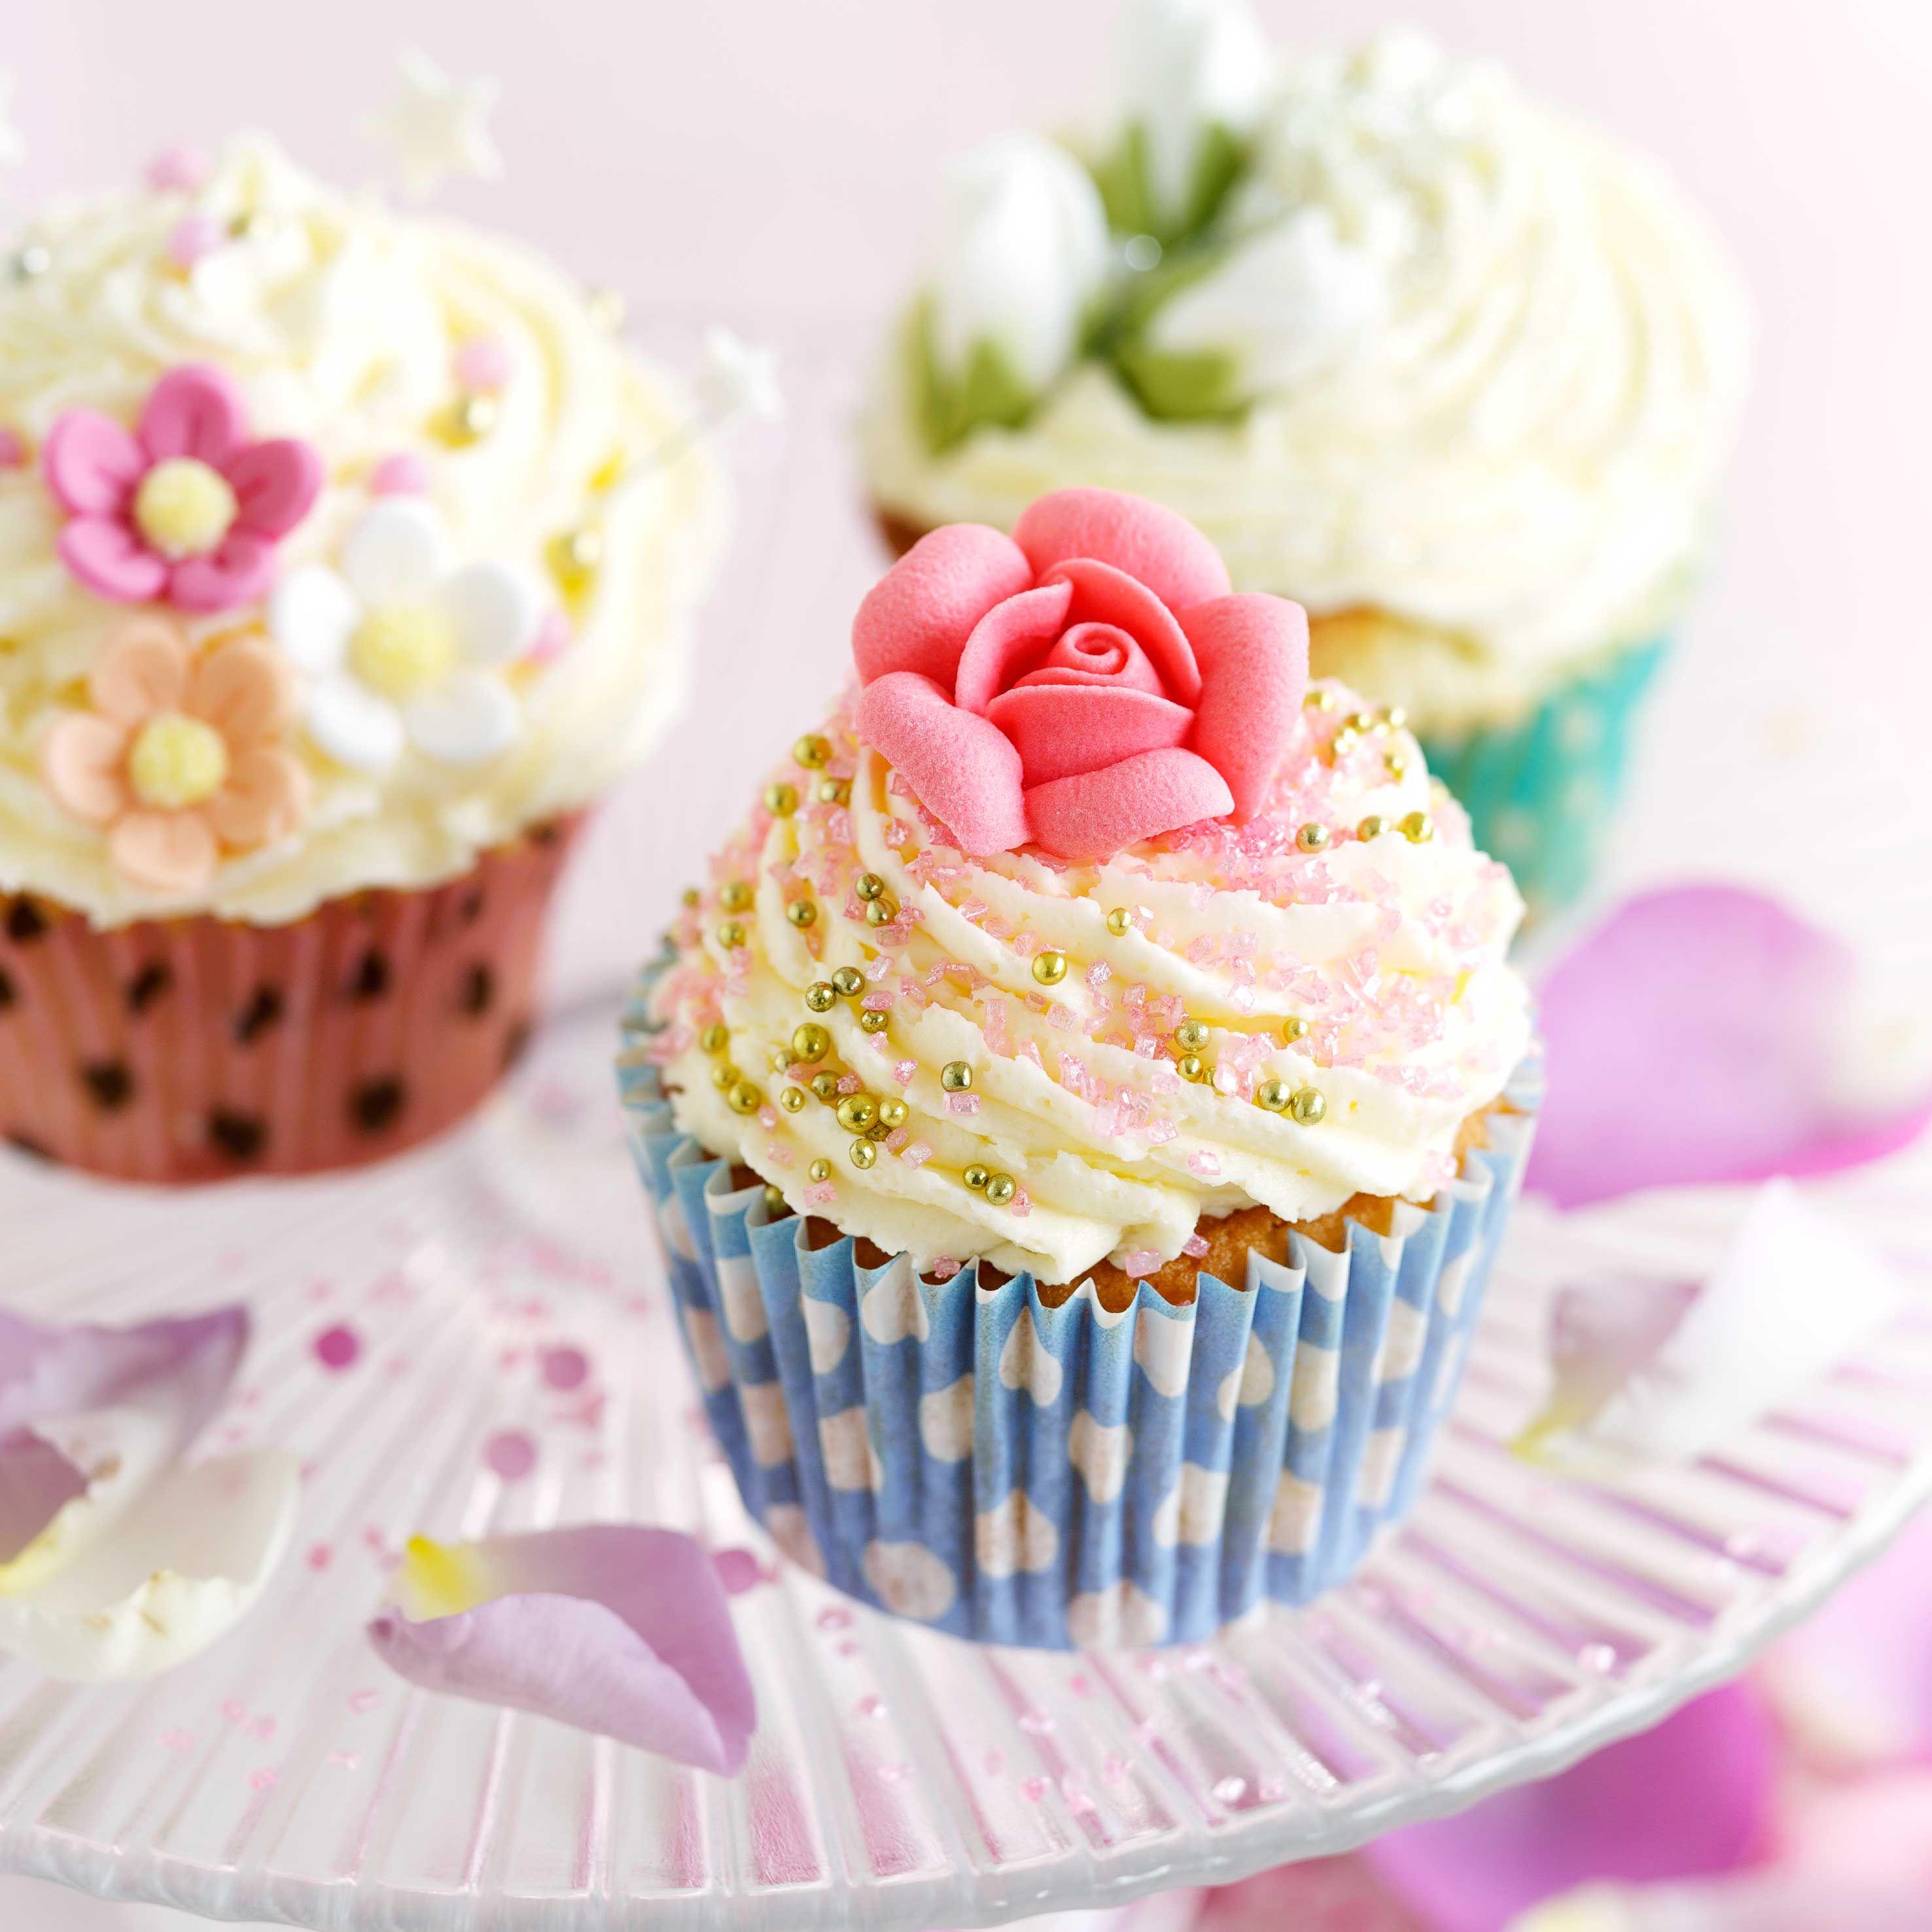 Cake Decorating: 3 expert tips | Easy cake decorating ...